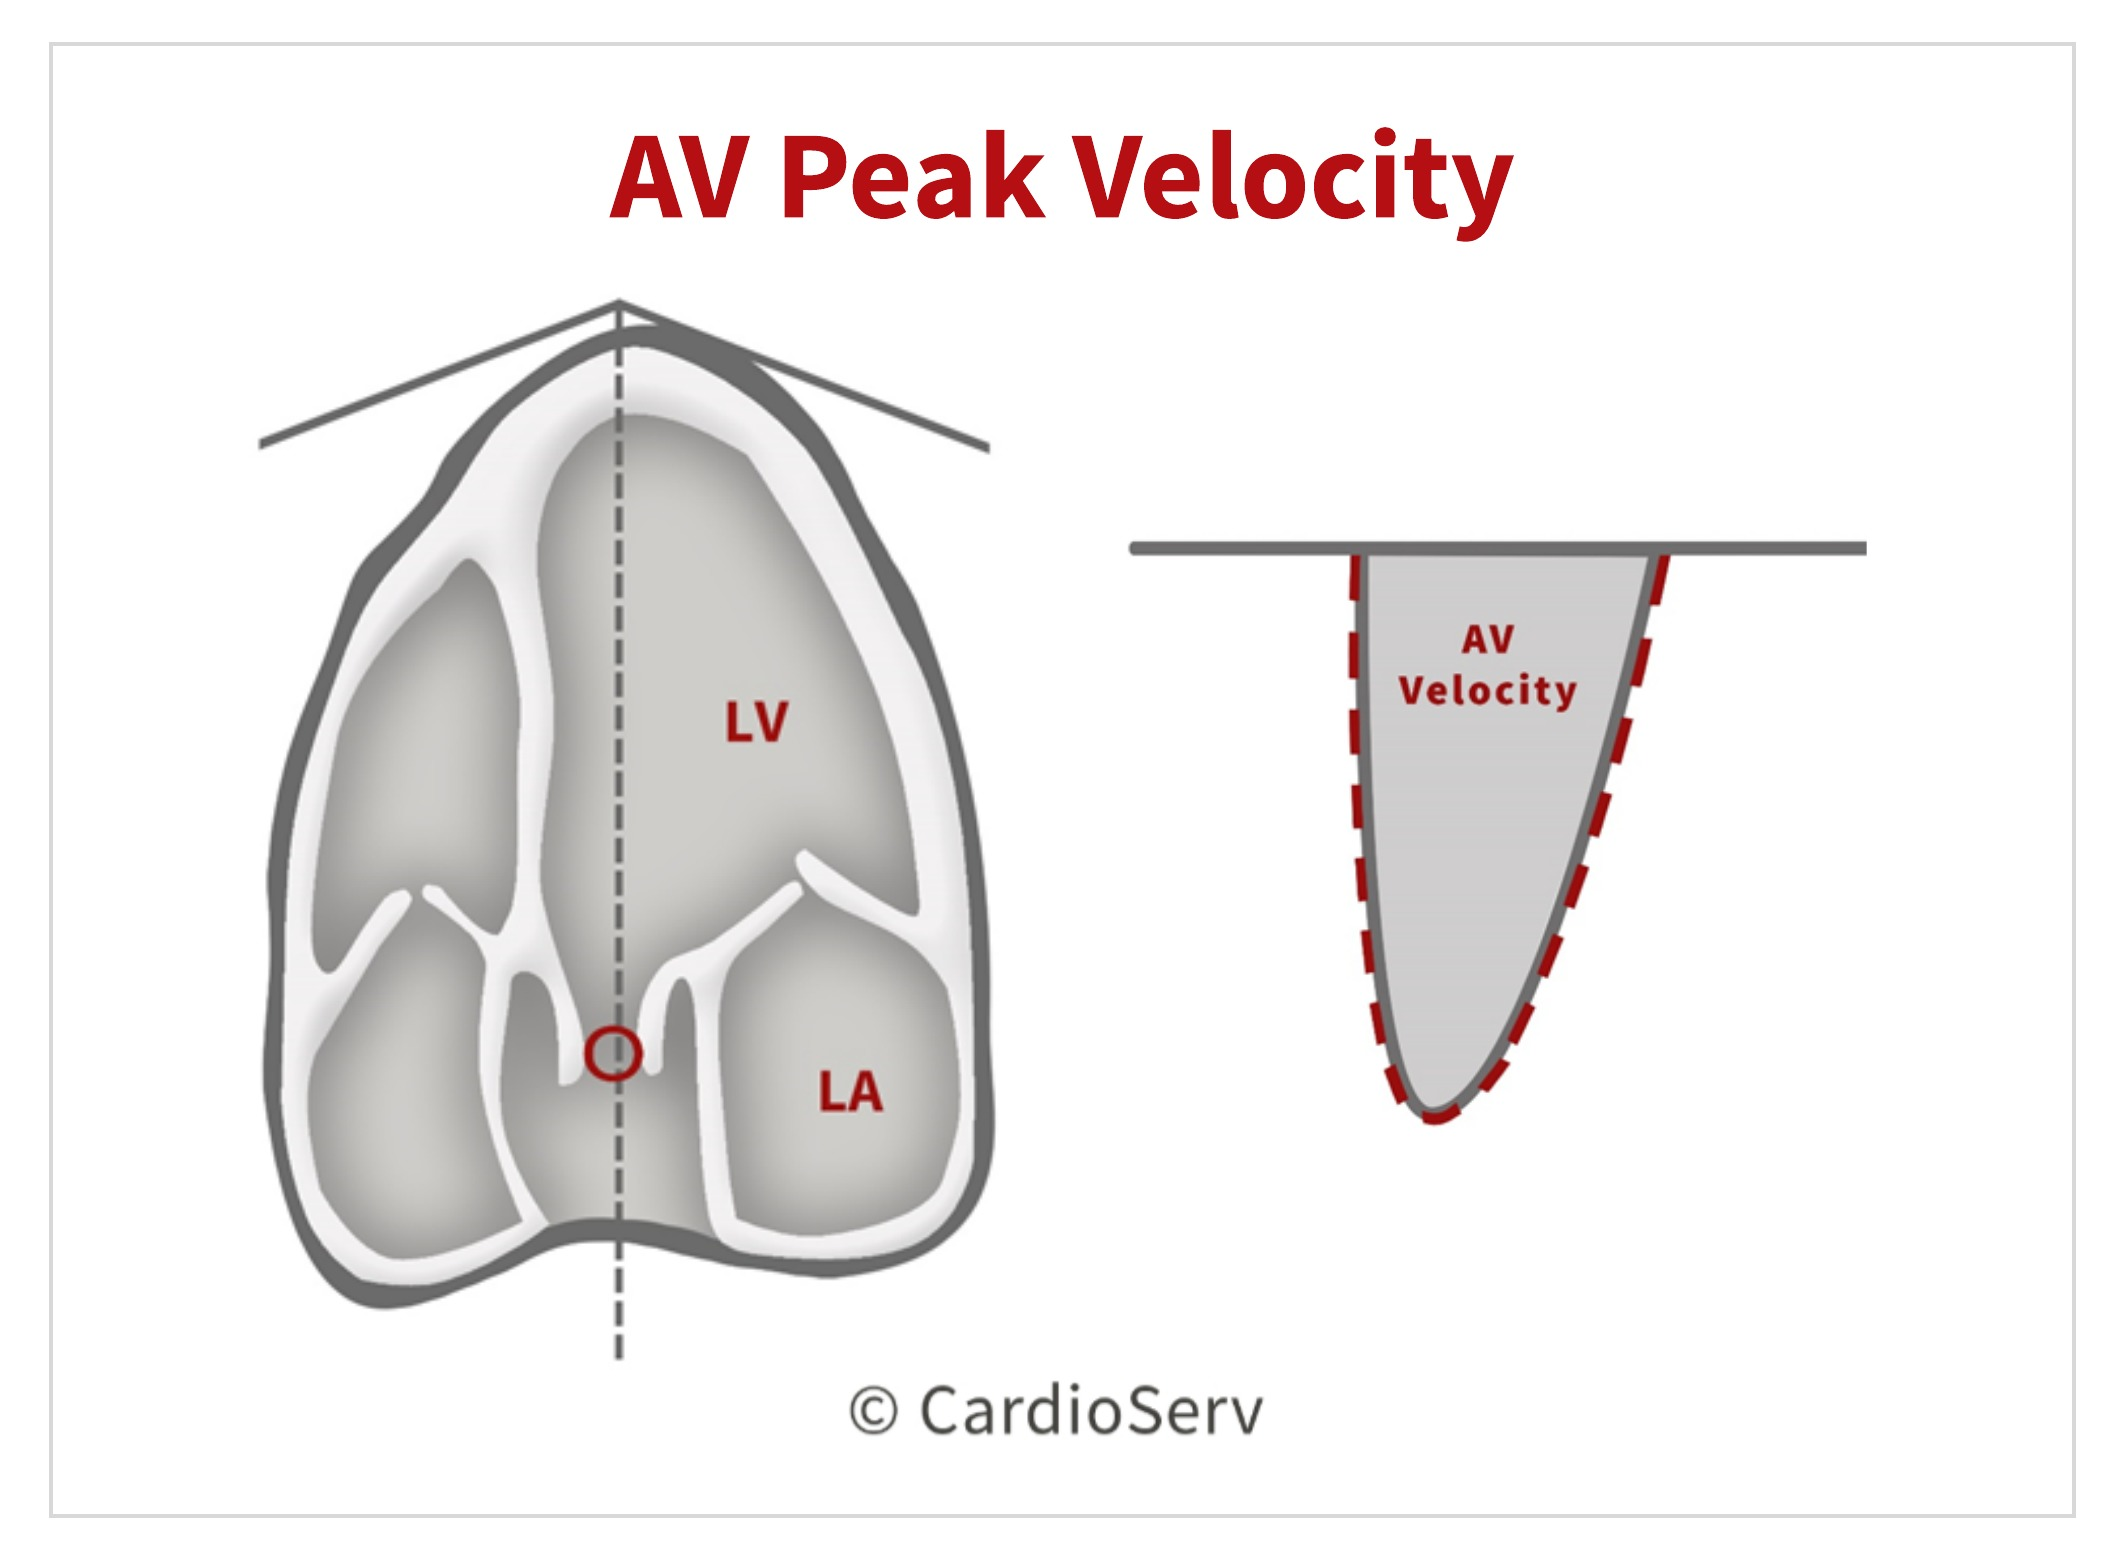 Aortic Valve Velocity